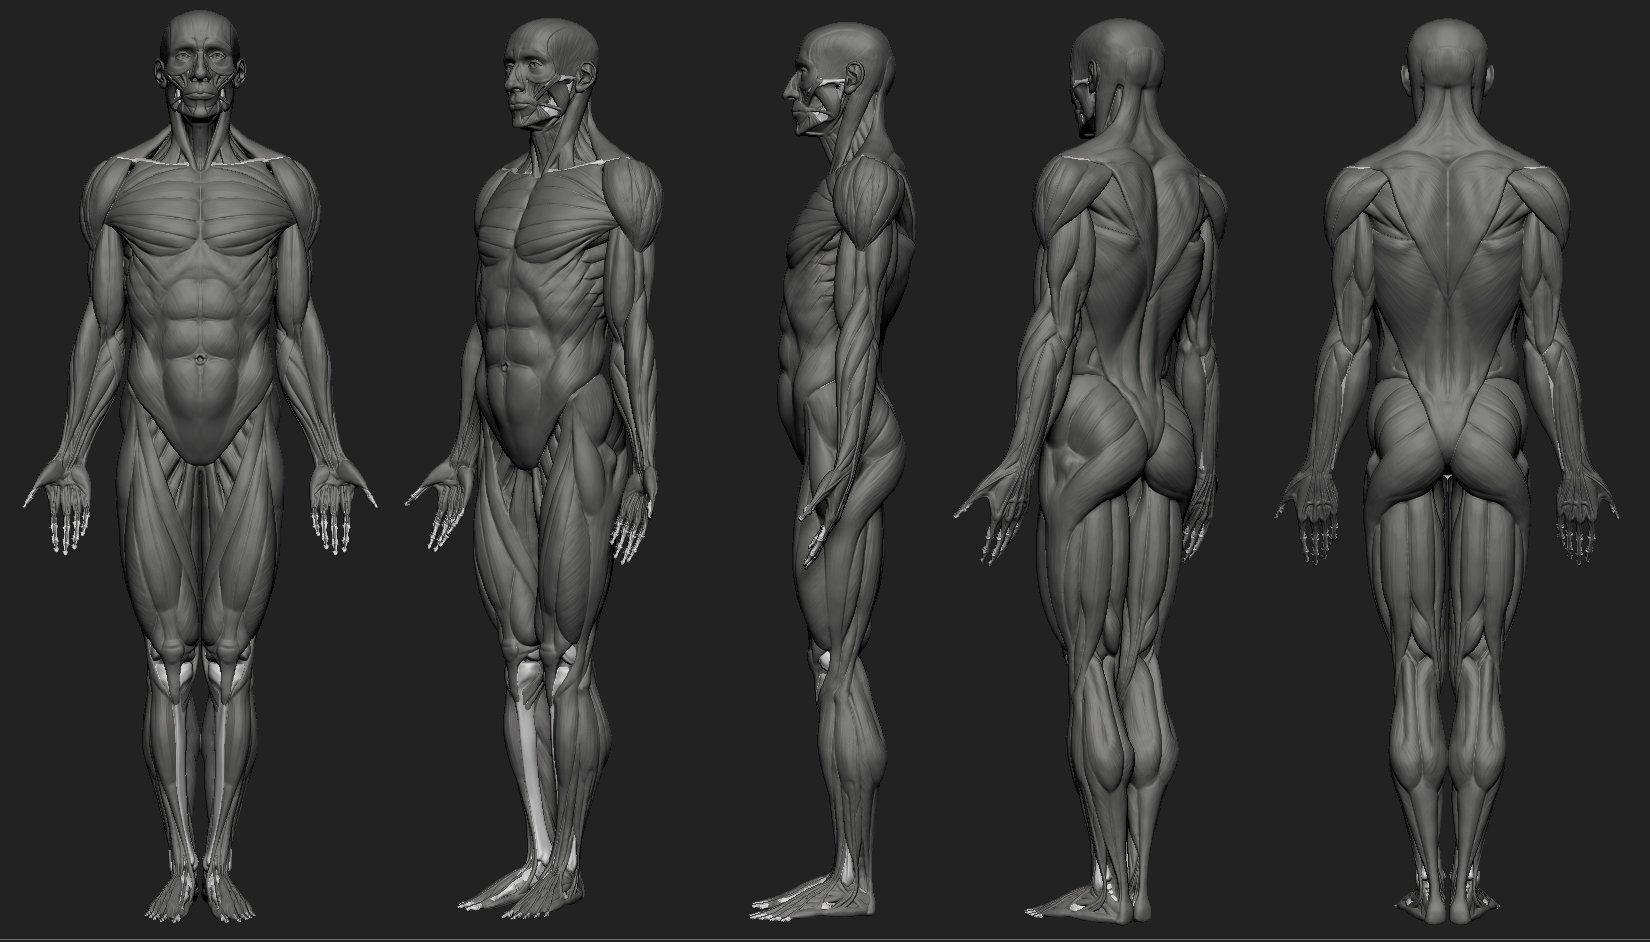 ArtStation - Human male anatomy study ecorche, Artur Owsnicki ...